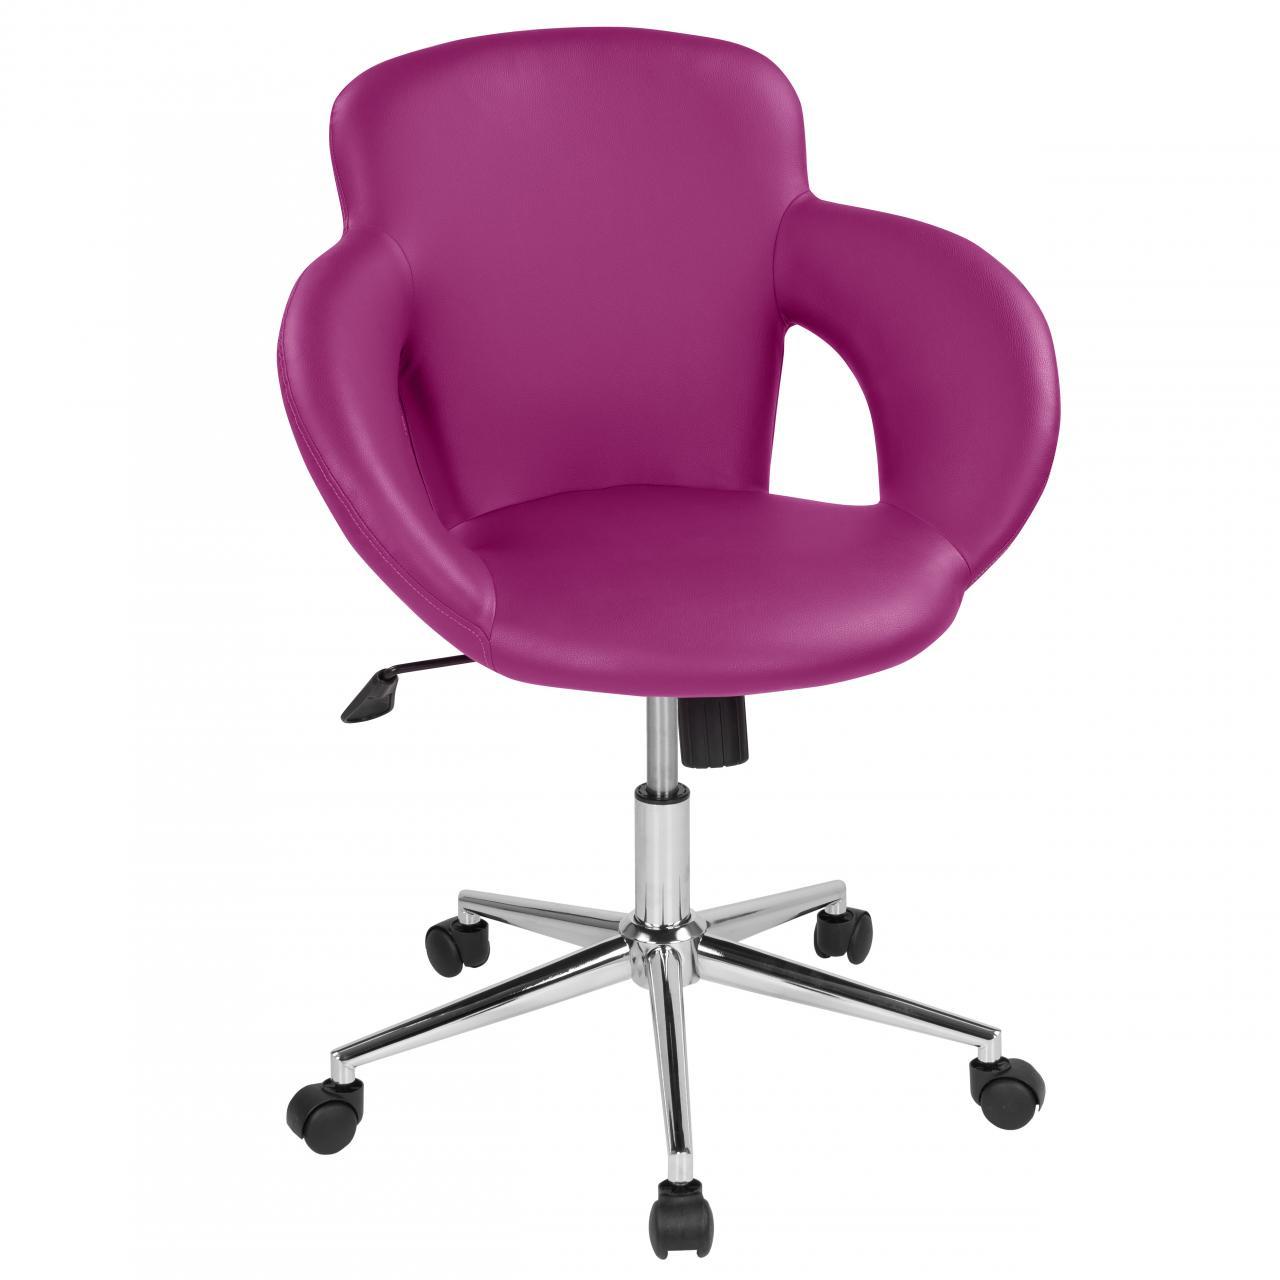 drehstuhl mit design drehkreuz b rostuhl schreibtischstuhl drehhocker lila ebay. Black Bedroom Furniture Sets. Home Design Ideas